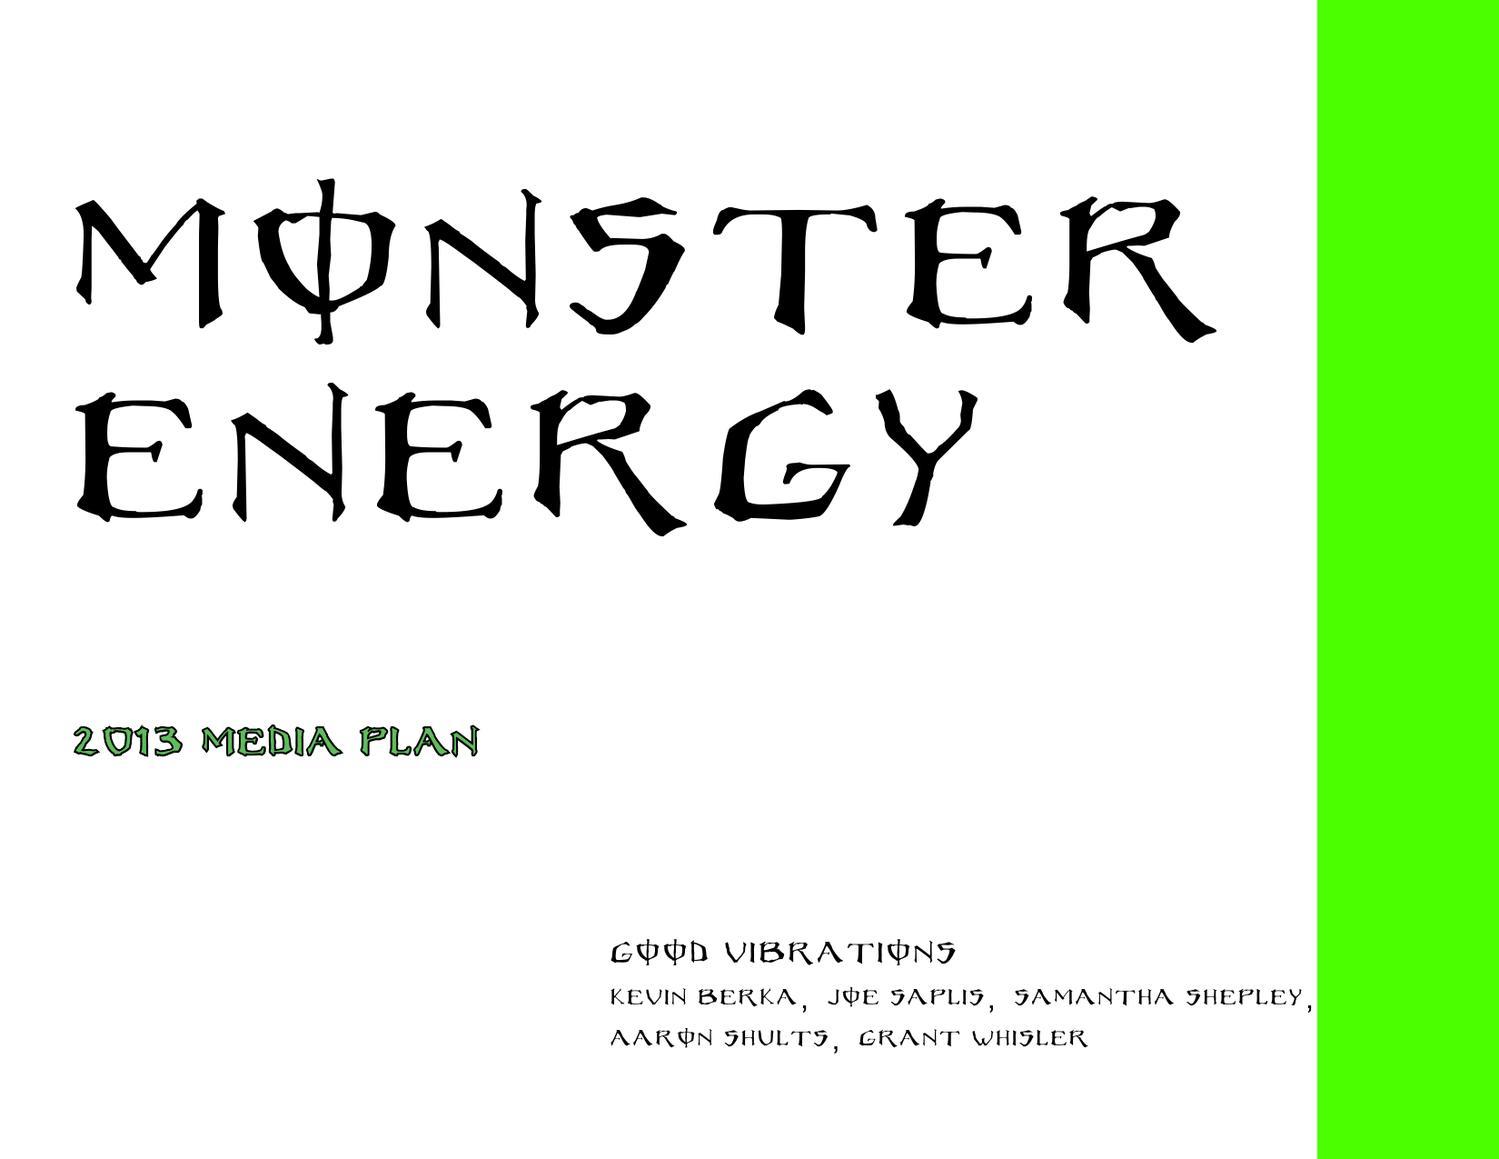 d891e9160 Monster Energy Media Plan by joe saplis - issuu